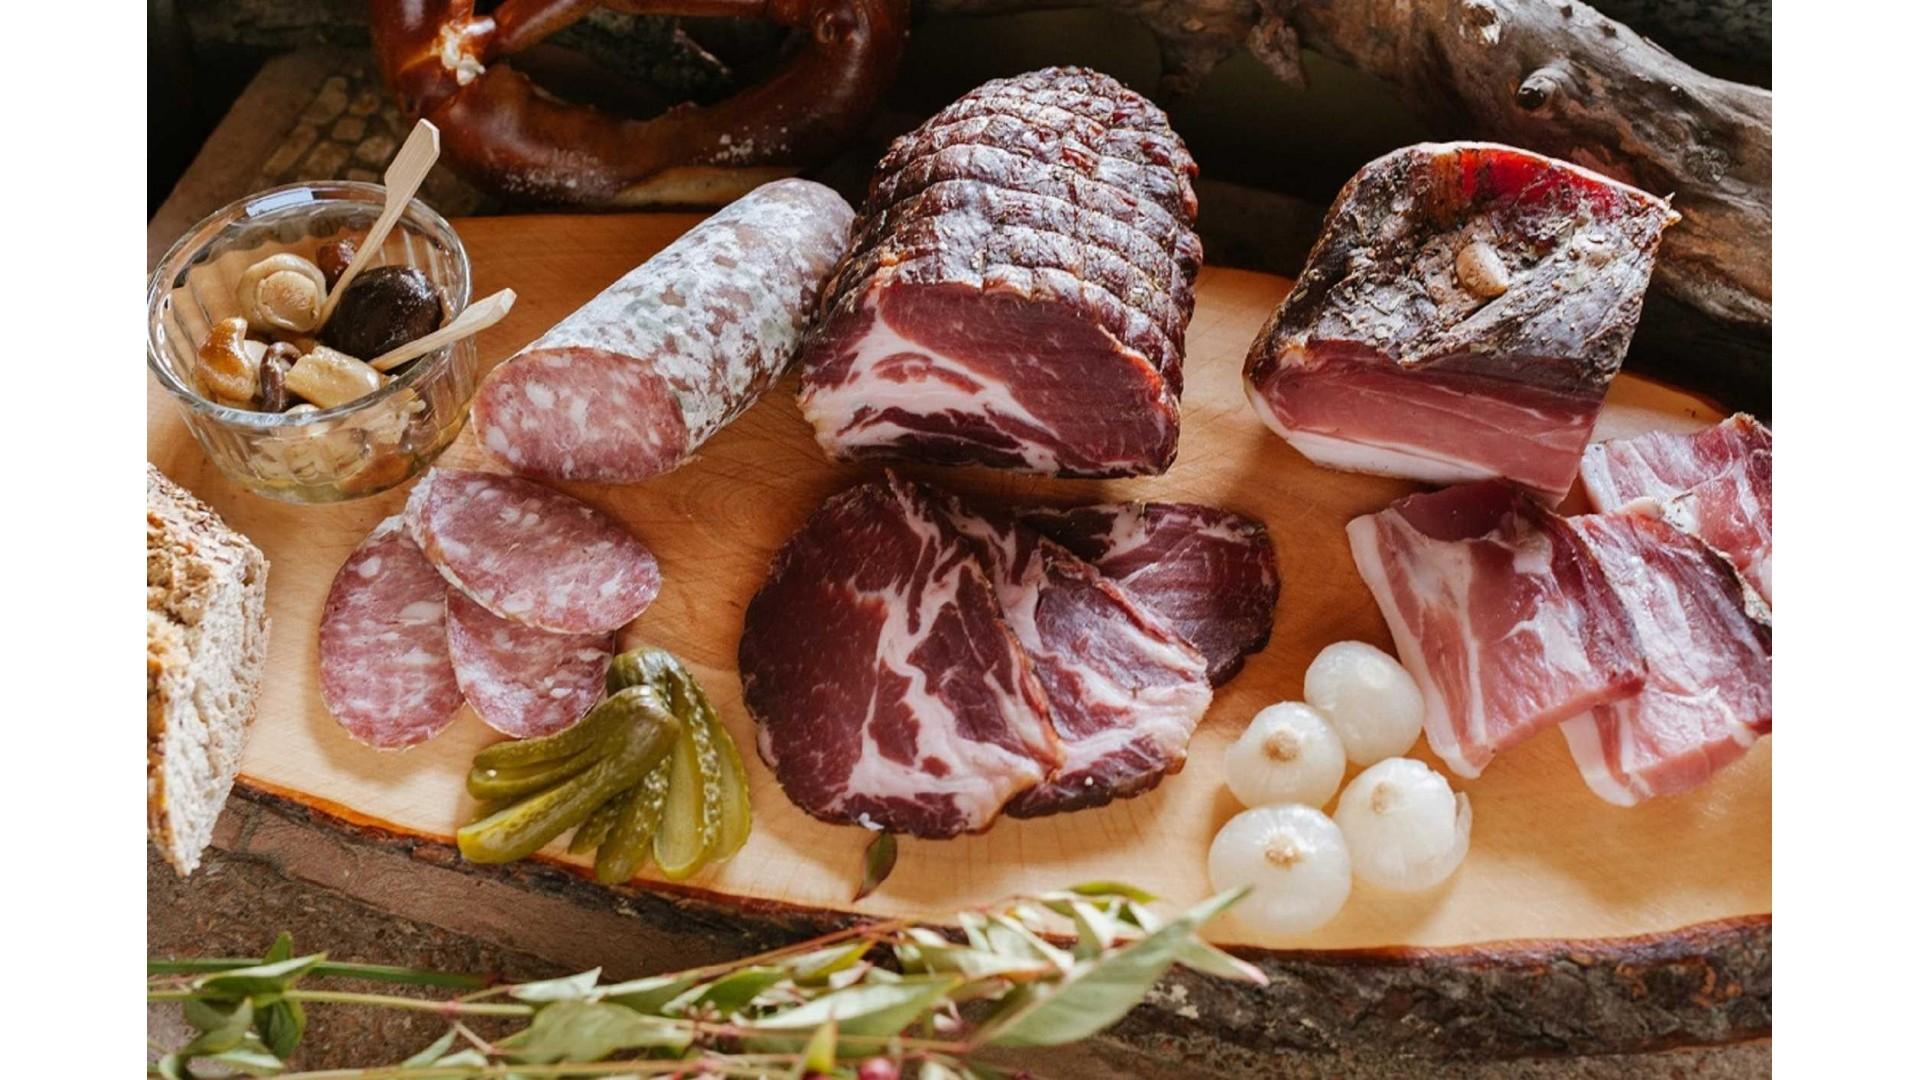 Salami from Trentino